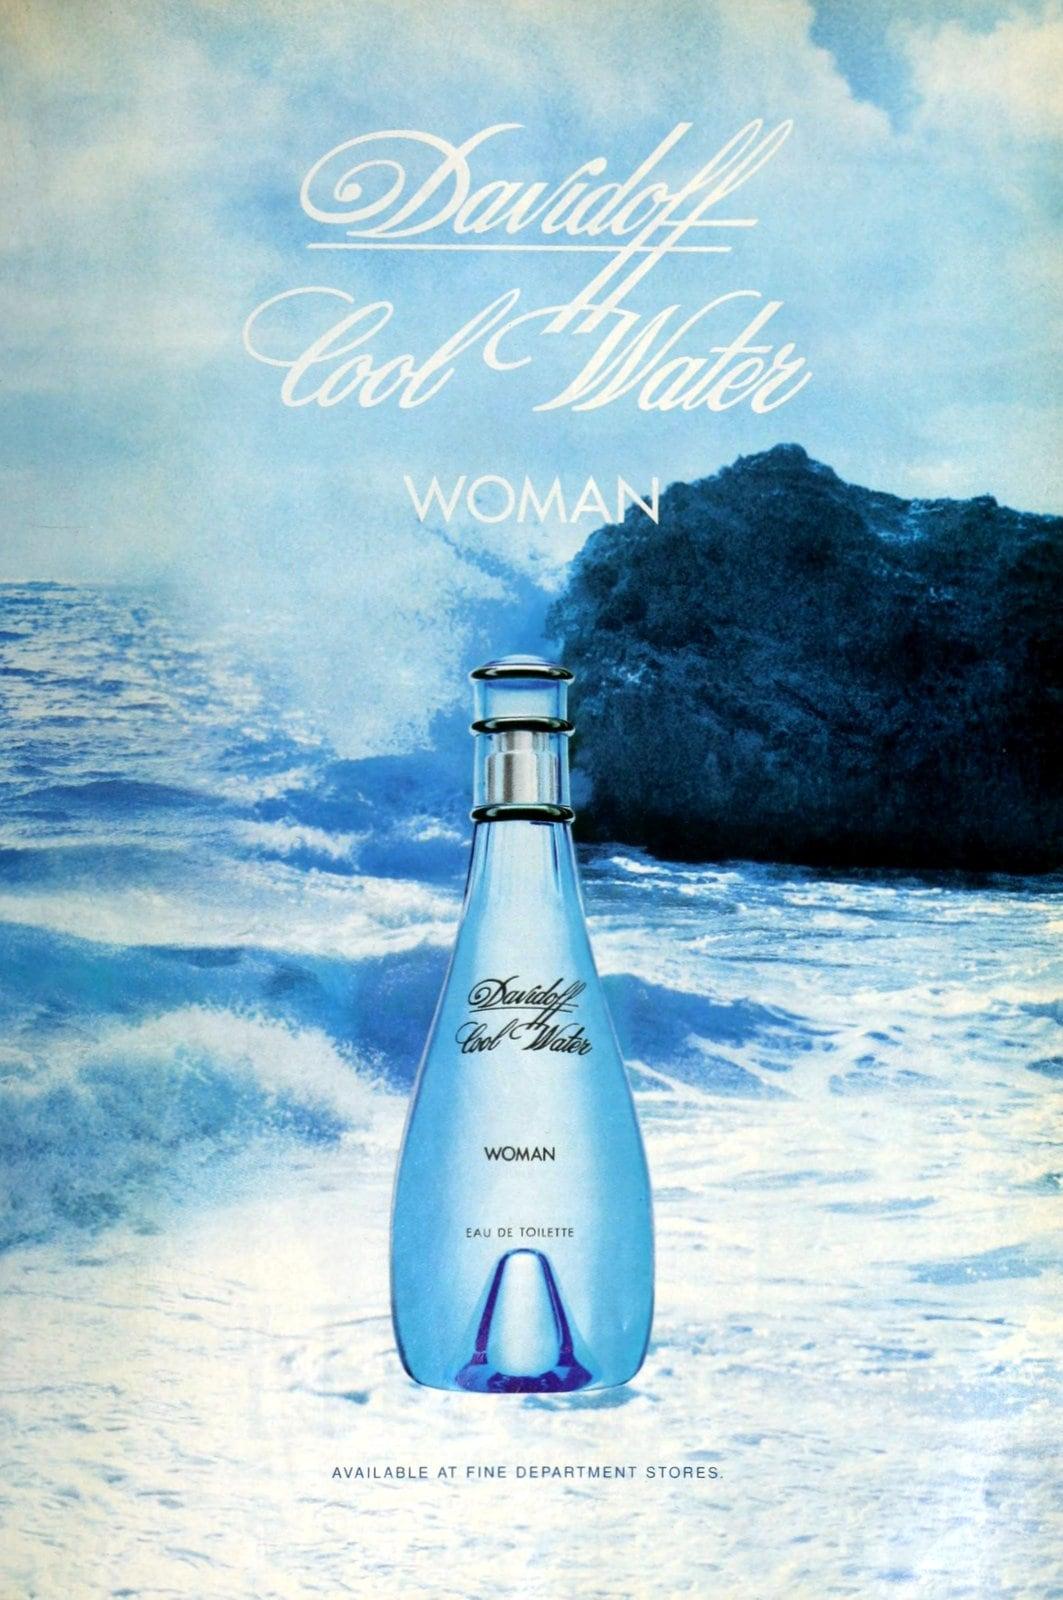 Cool Water woman from Davidoff (1997) at ClickAmericana com